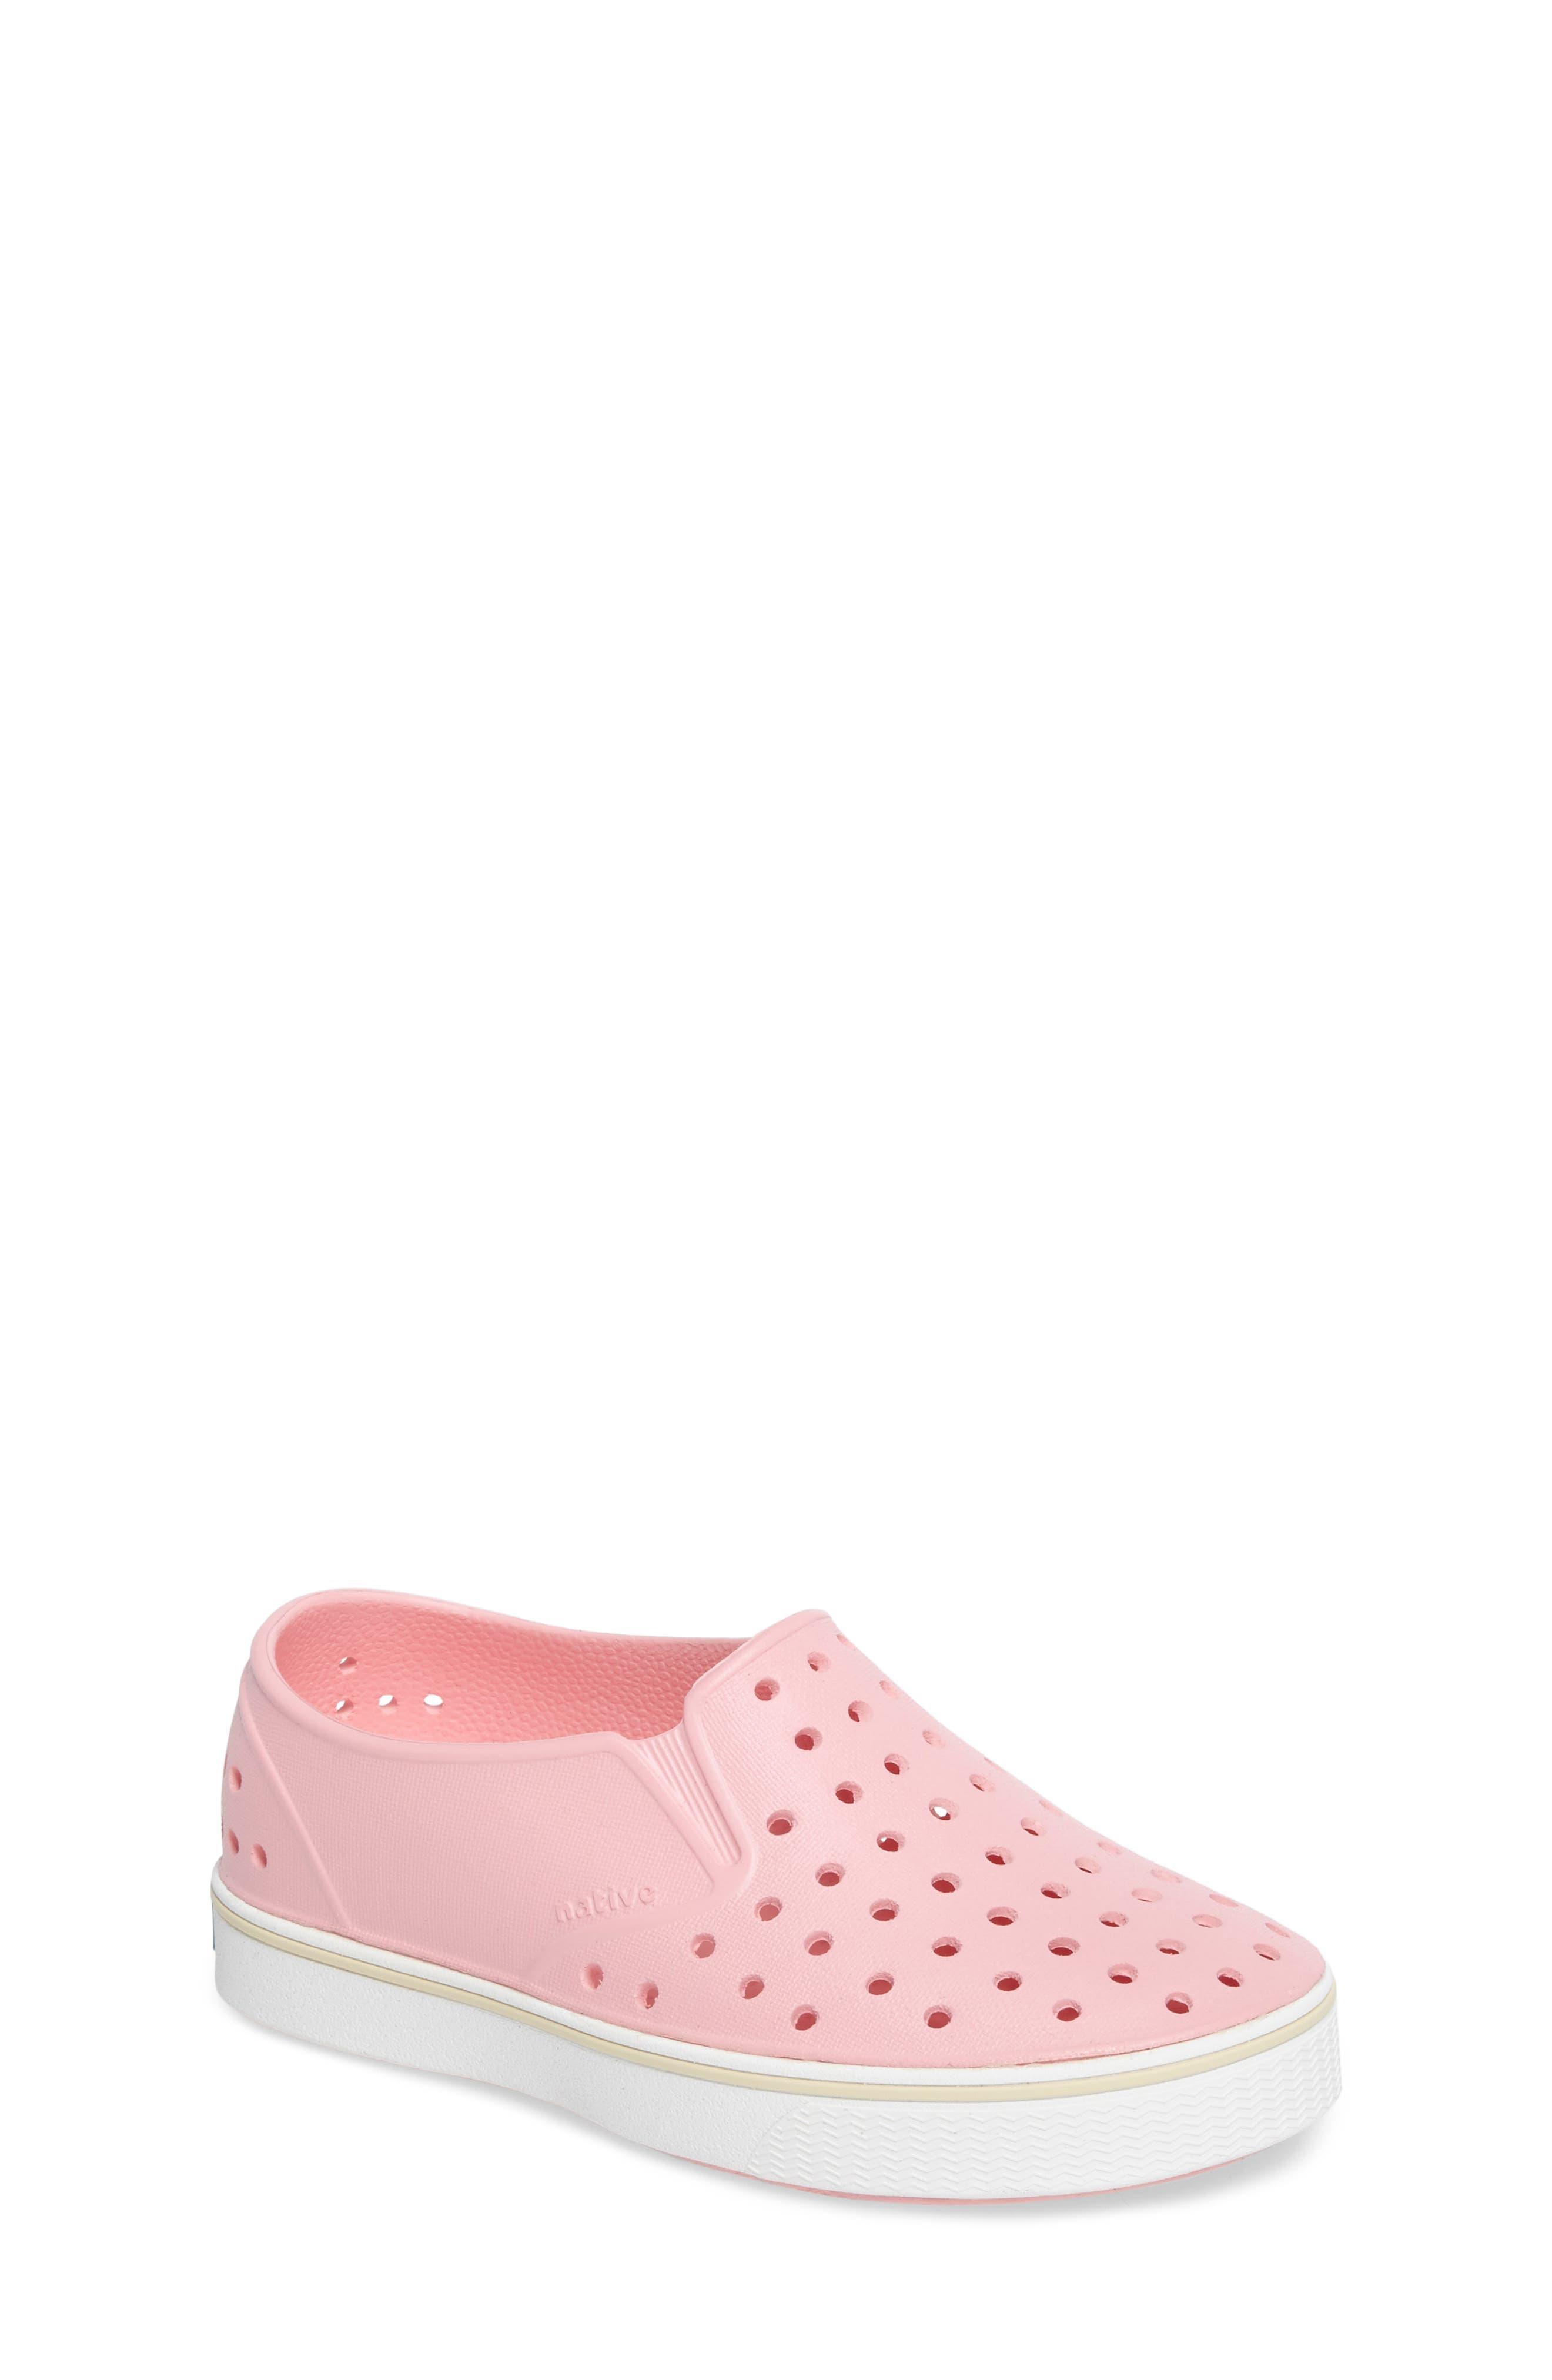 NATIVE SHOES Miles Slip-On Sneaker